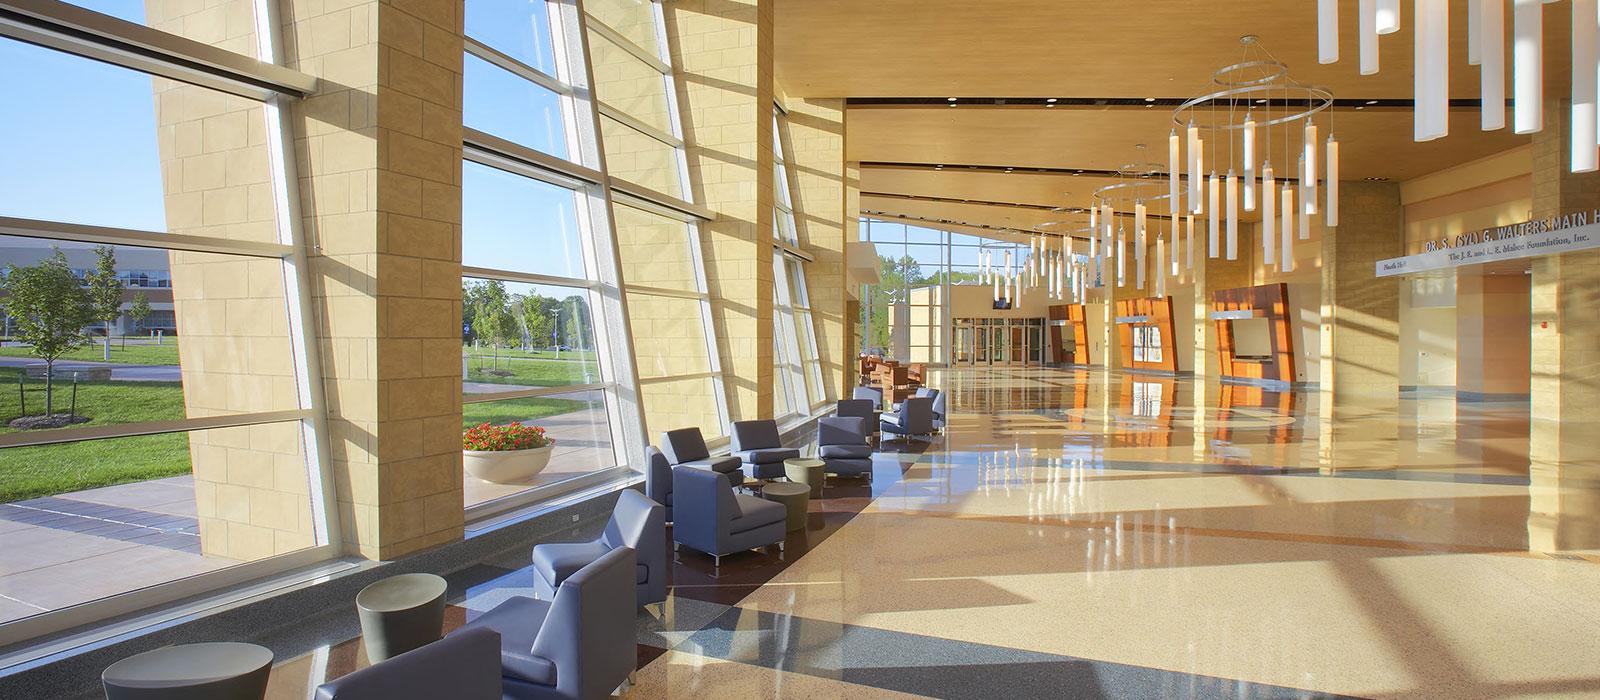 Purser Center lobby.